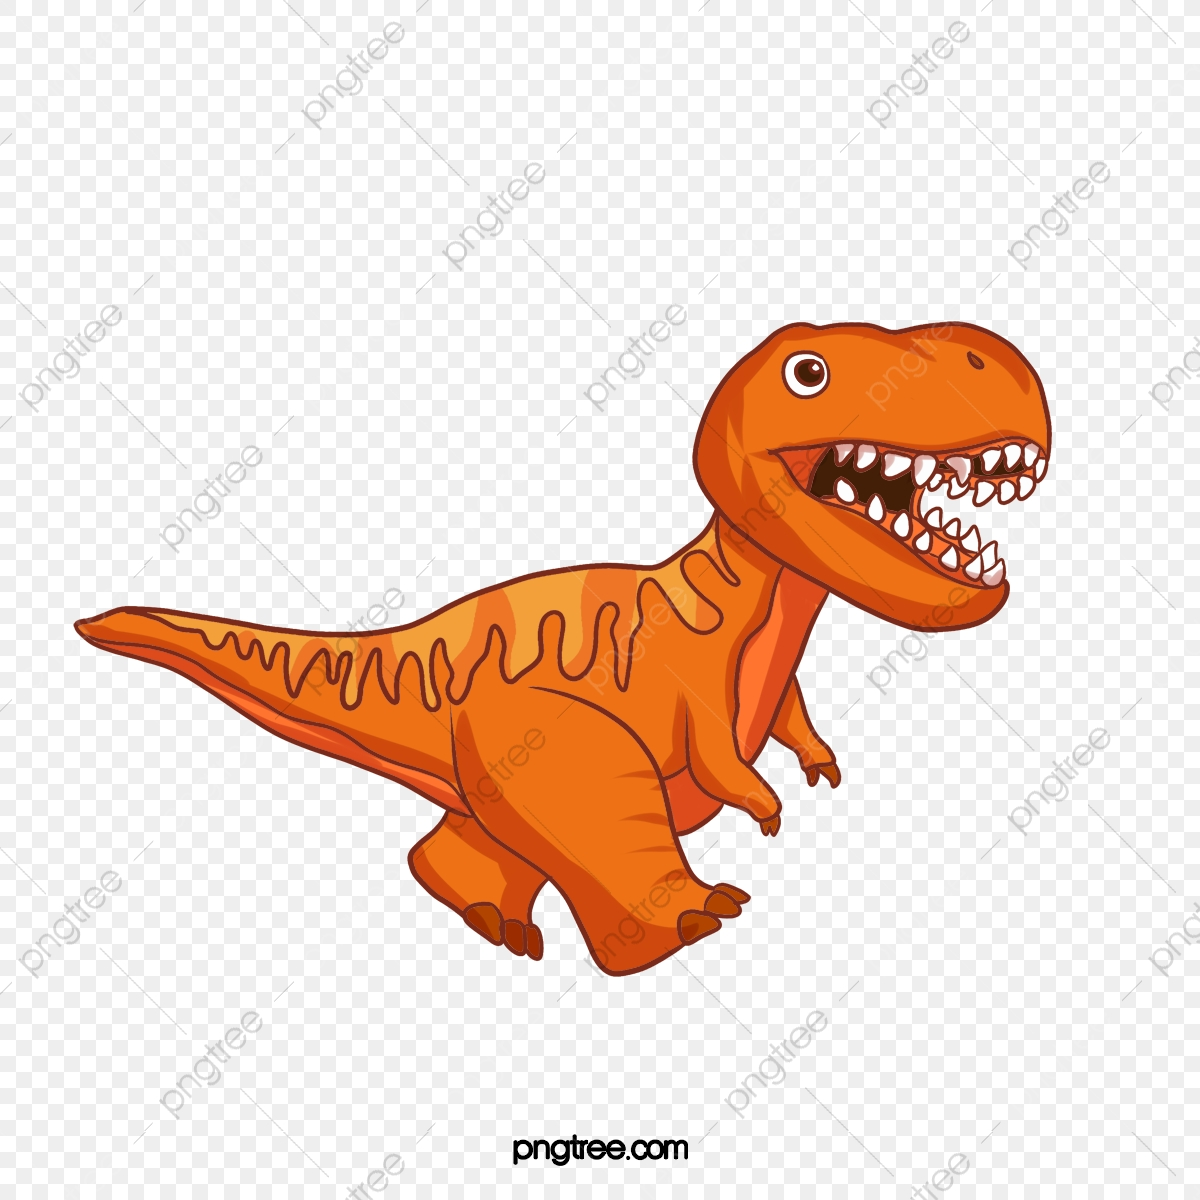 Desenho Dinossauro Os Dinossauros Desenho Dinossauro Vector De